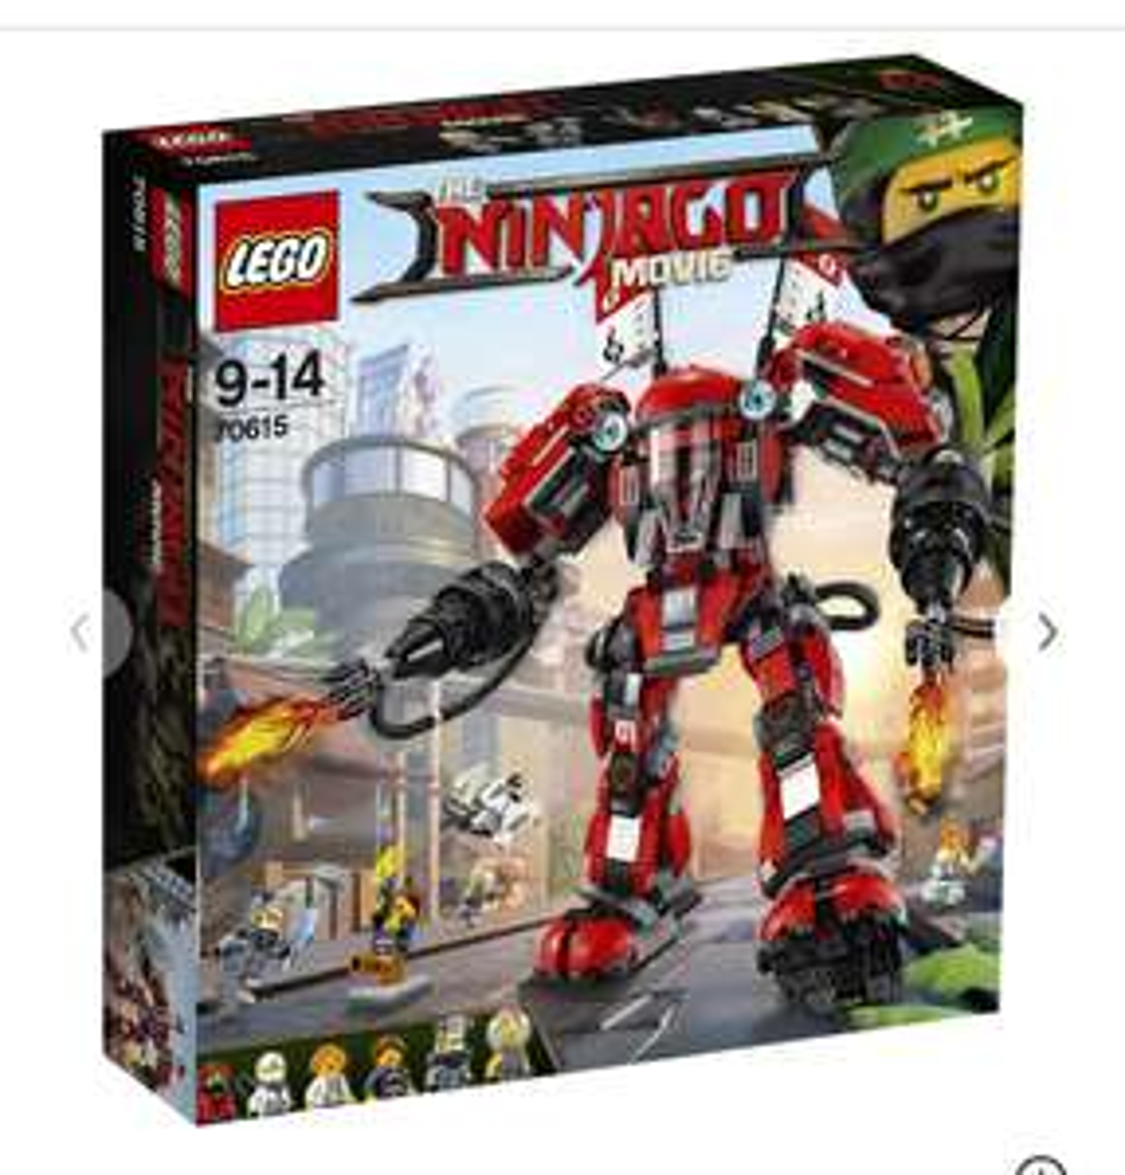 Lego Ninjago Movie Fire Mech Toy, £34.99 (with code LEGO5) @ Argos free c&c